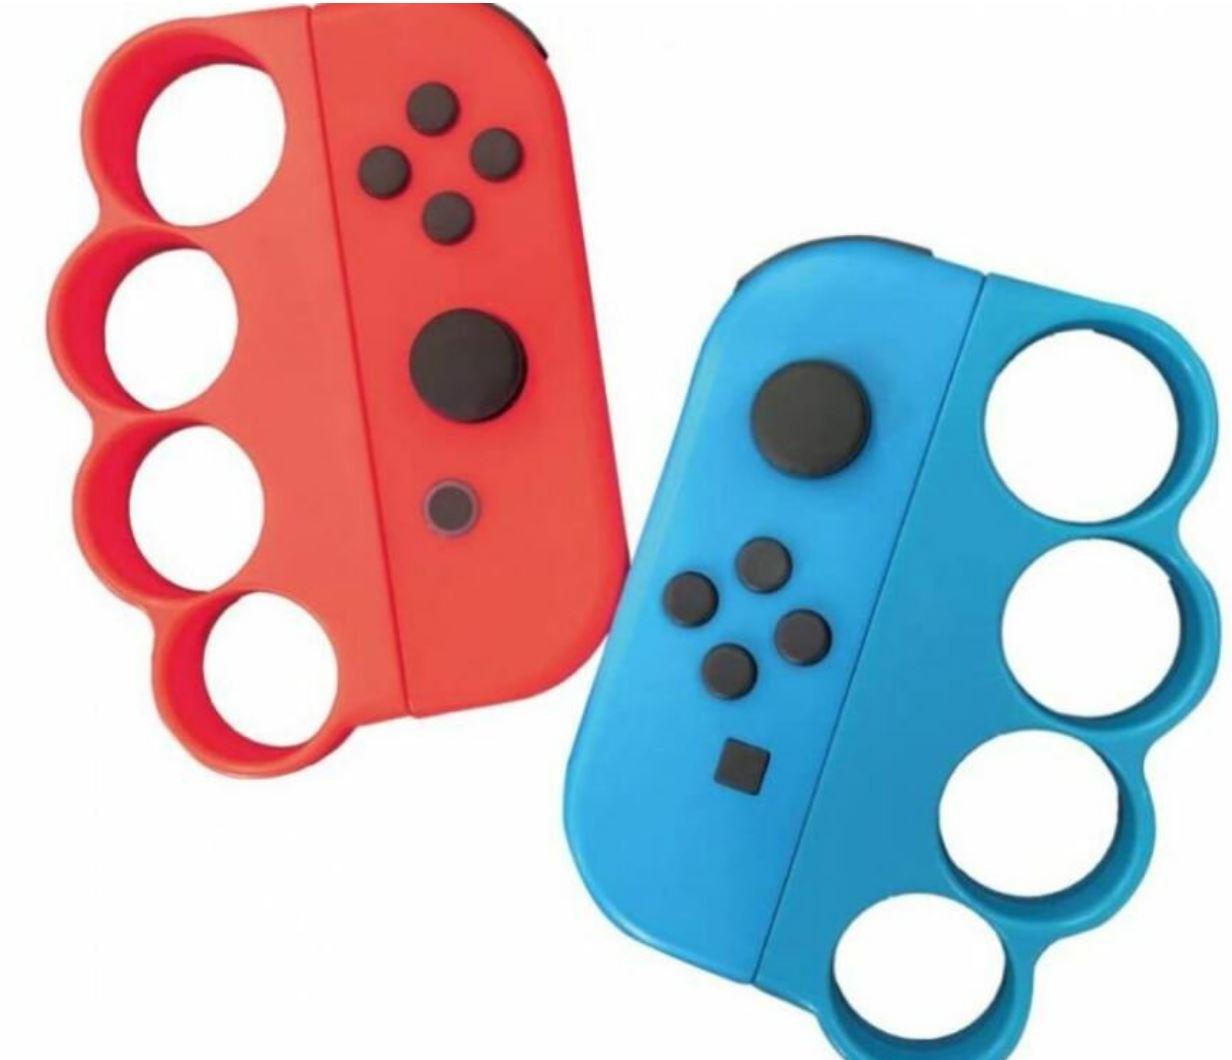 Nintendo Switch Joycon-Schlagringaufsätze von Playasia